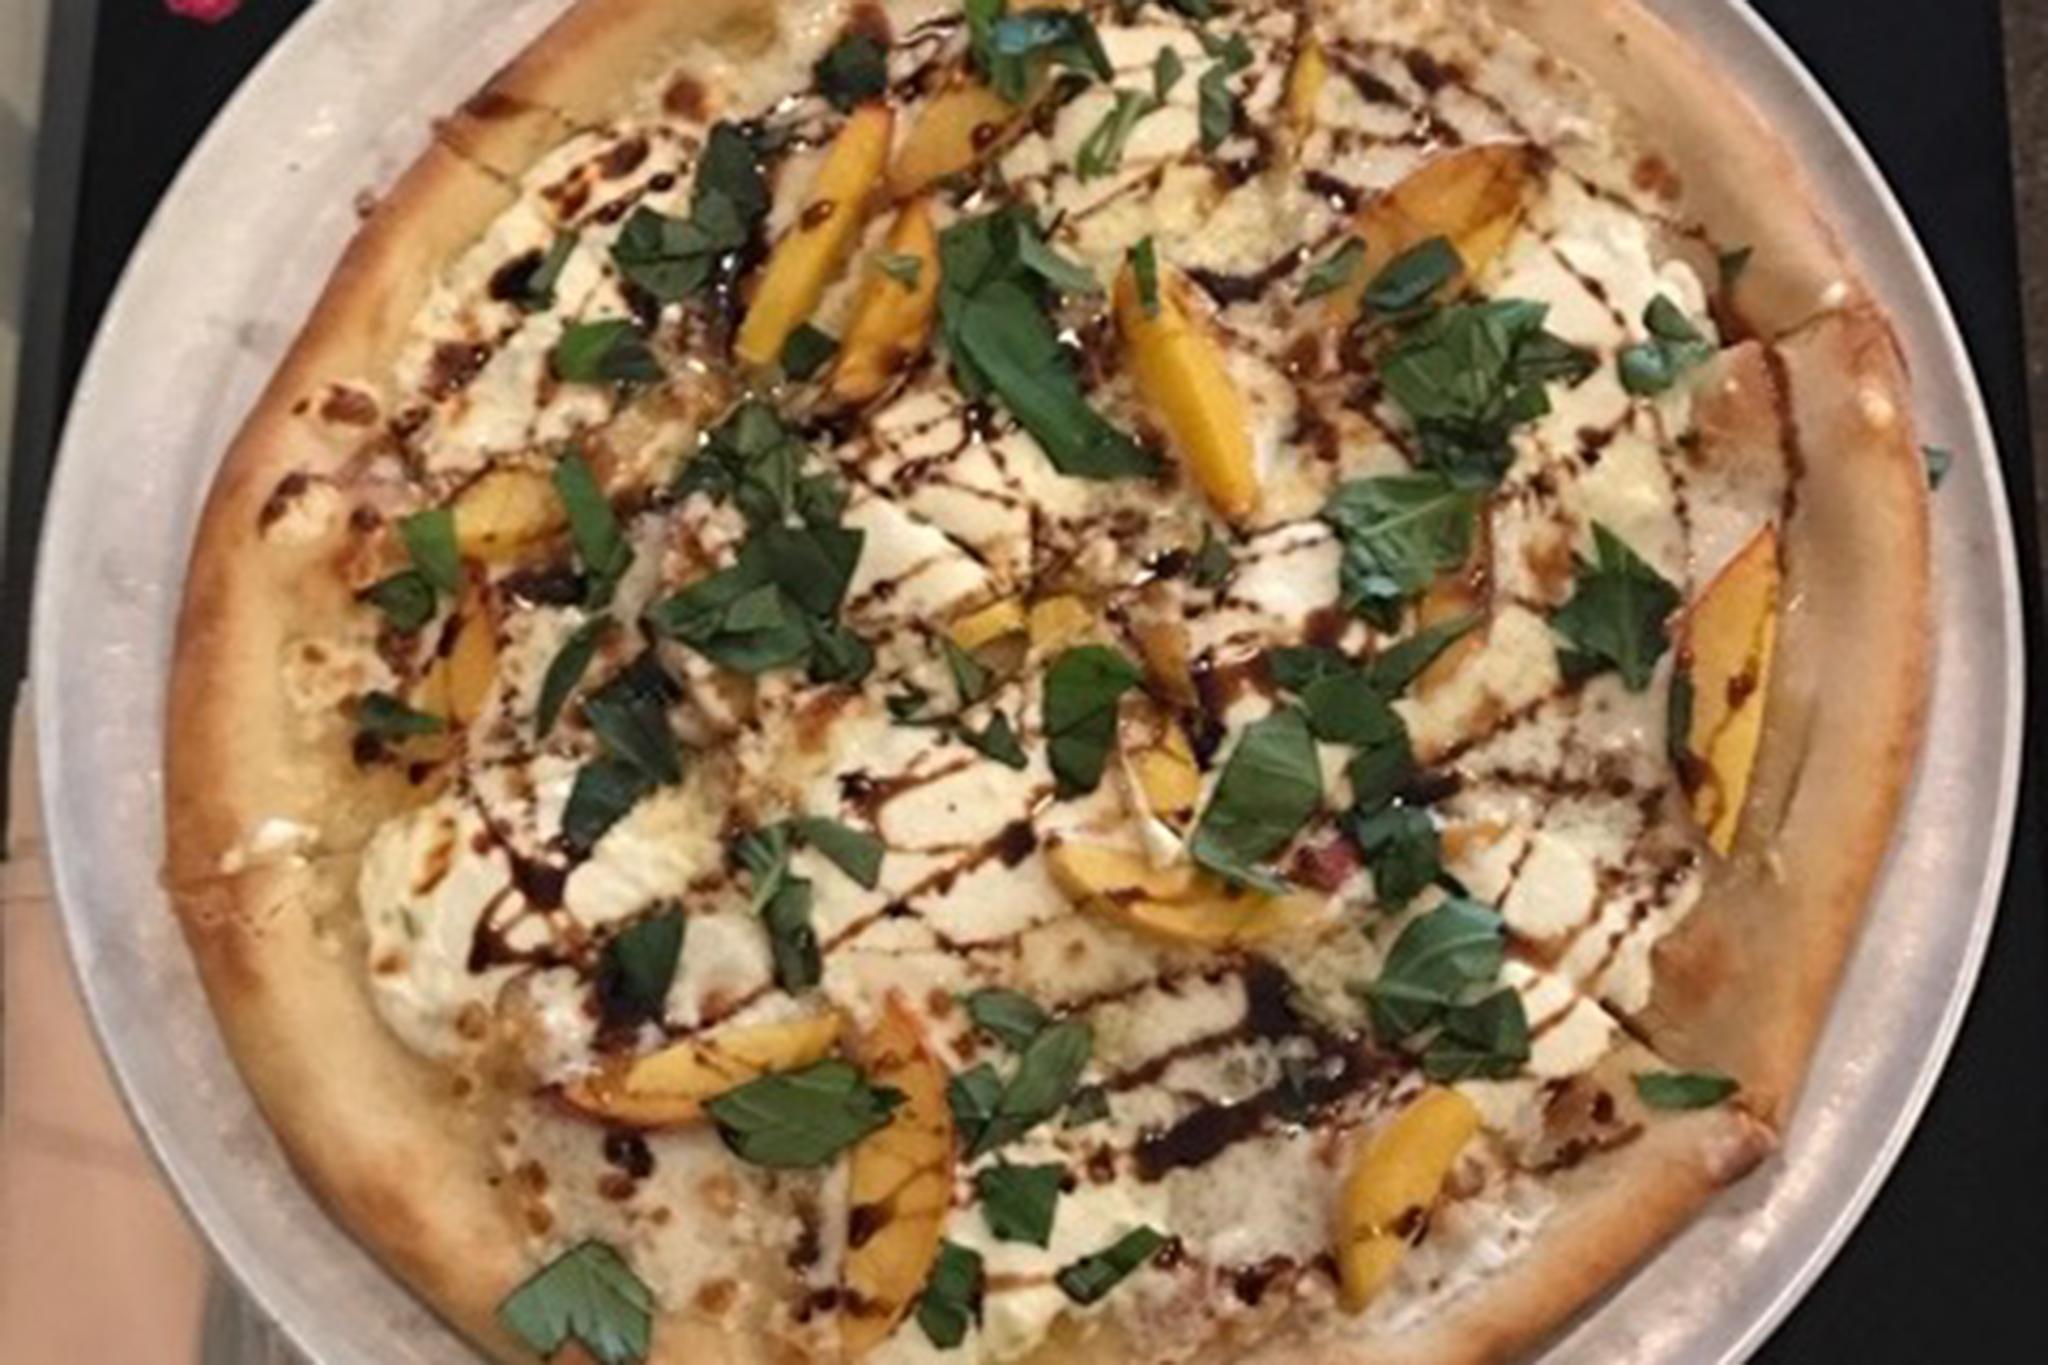 Peach balsamic pizza at Moss Café